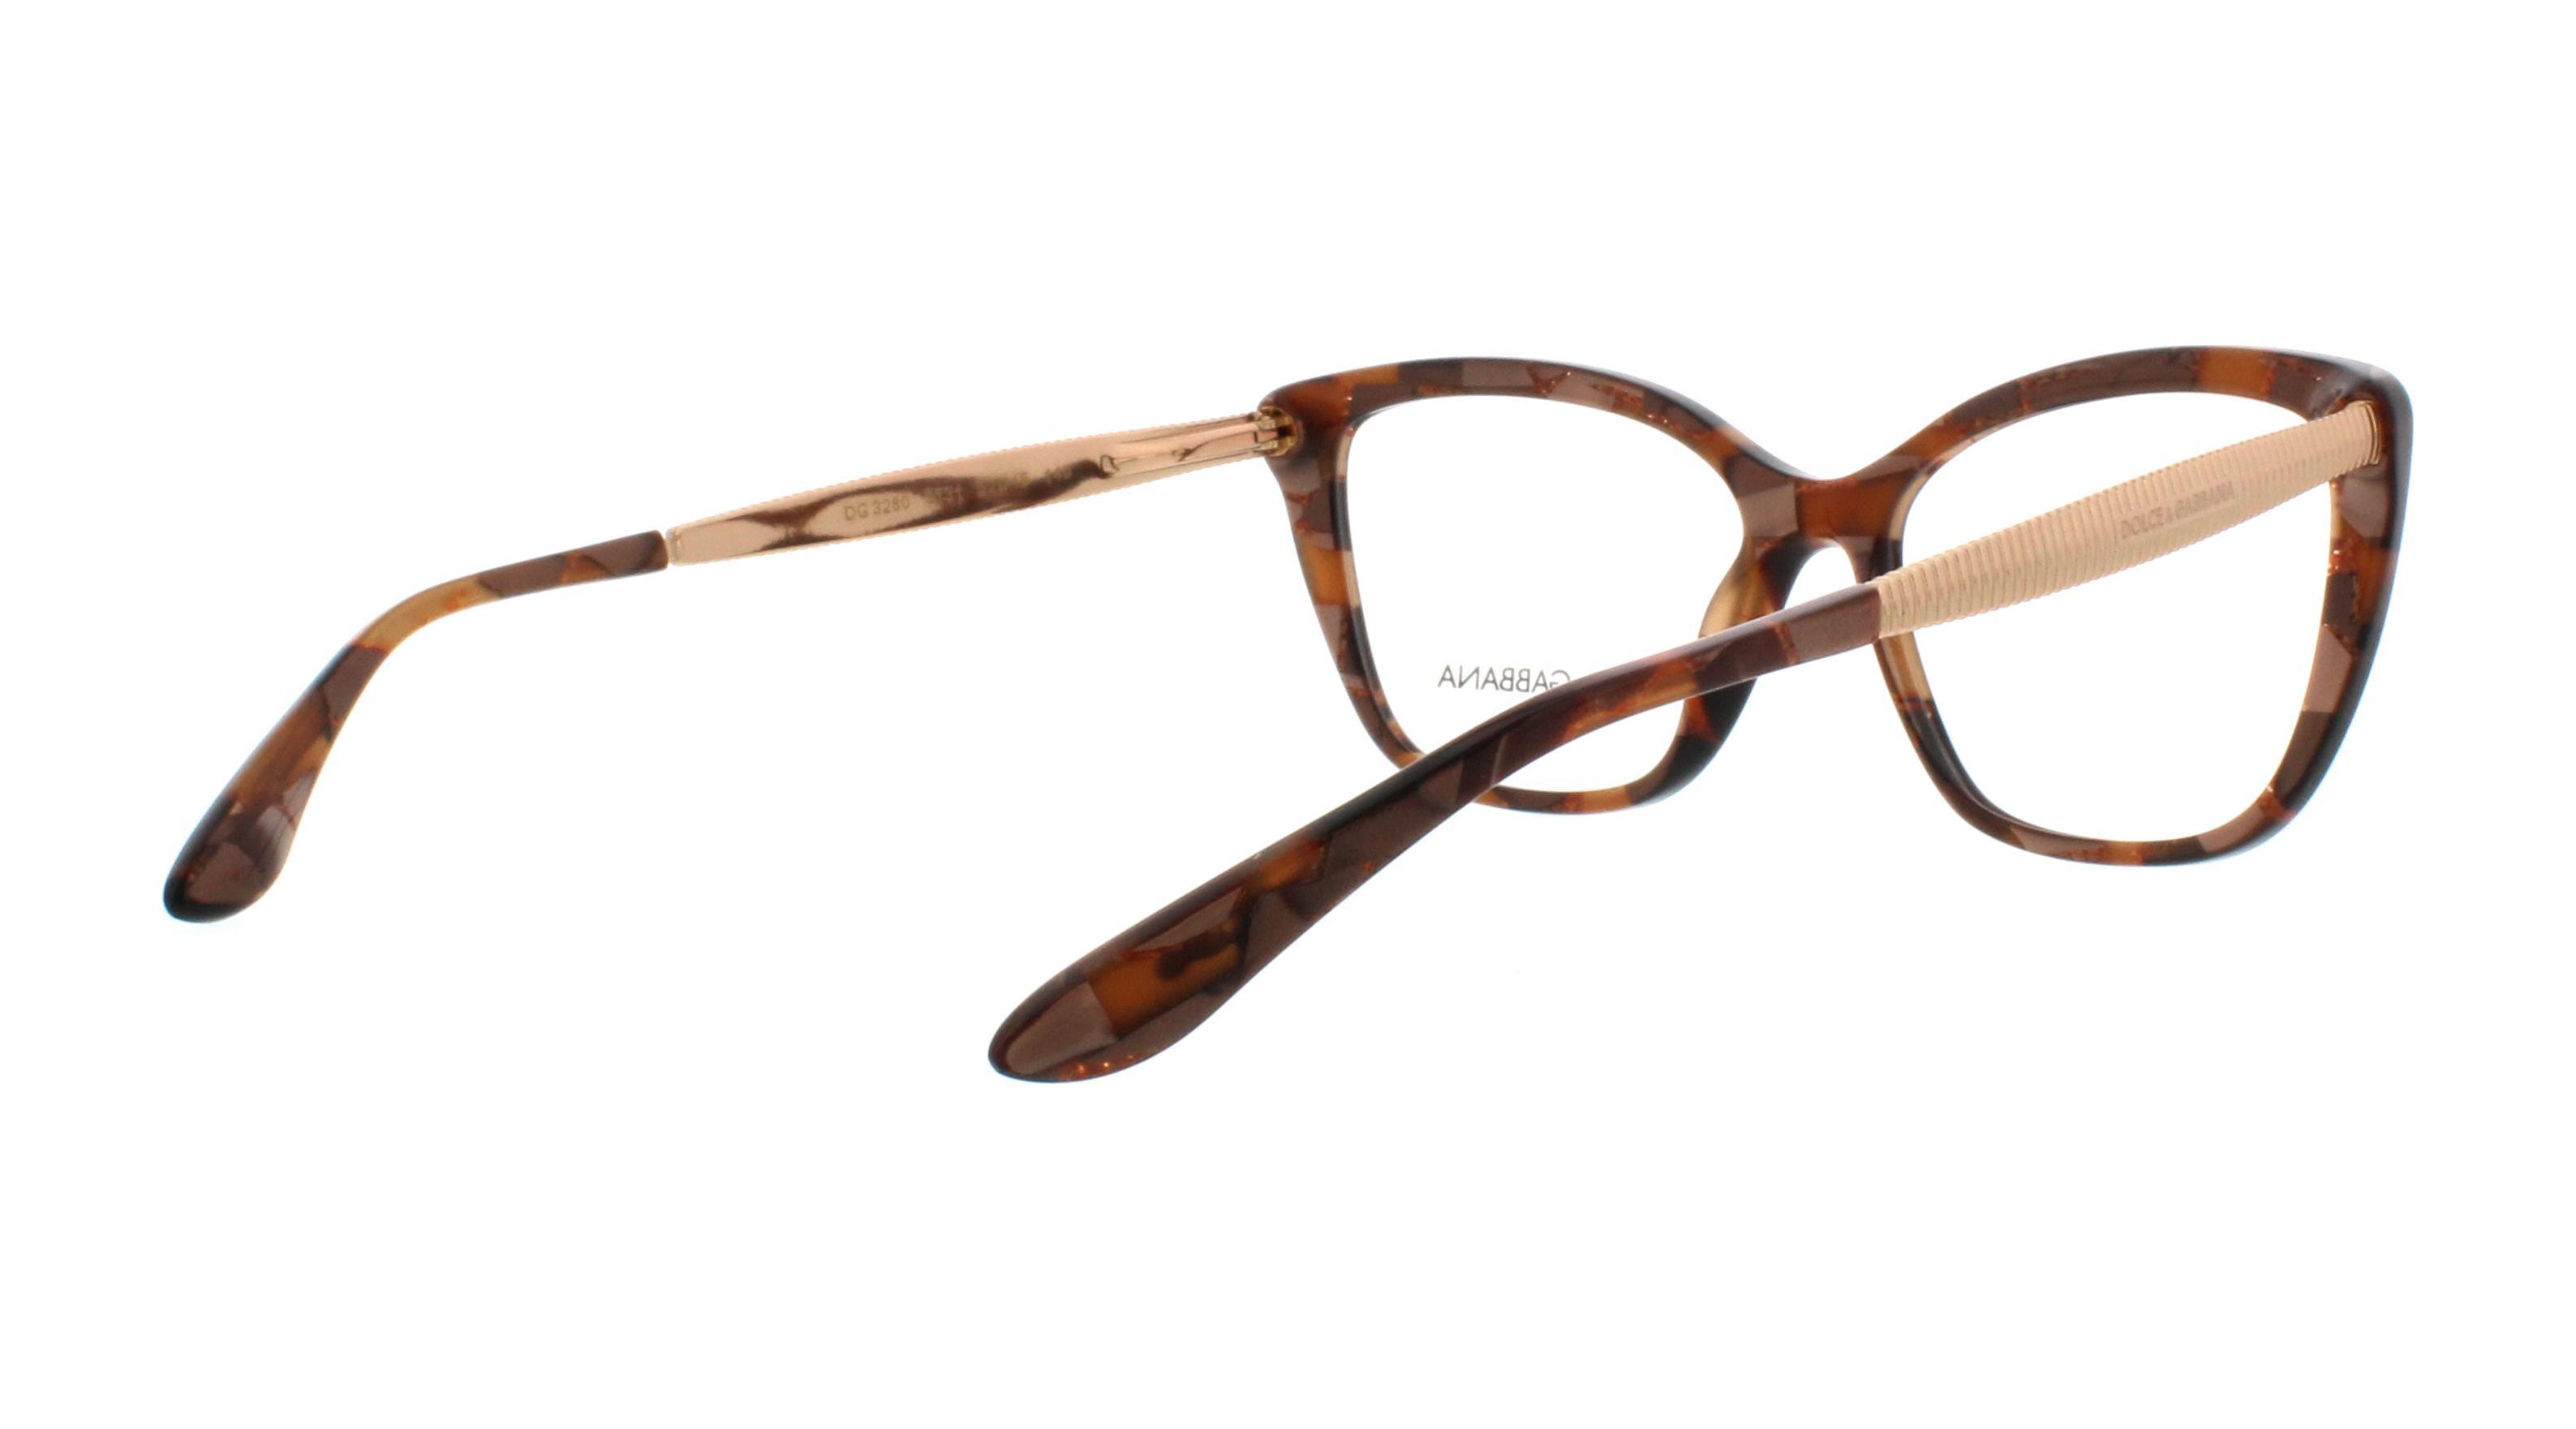 a1fc25bf2c90 DOLCE   GABBANA Eyeglasses DG3280 3131 Cube Bronze 52MM ...